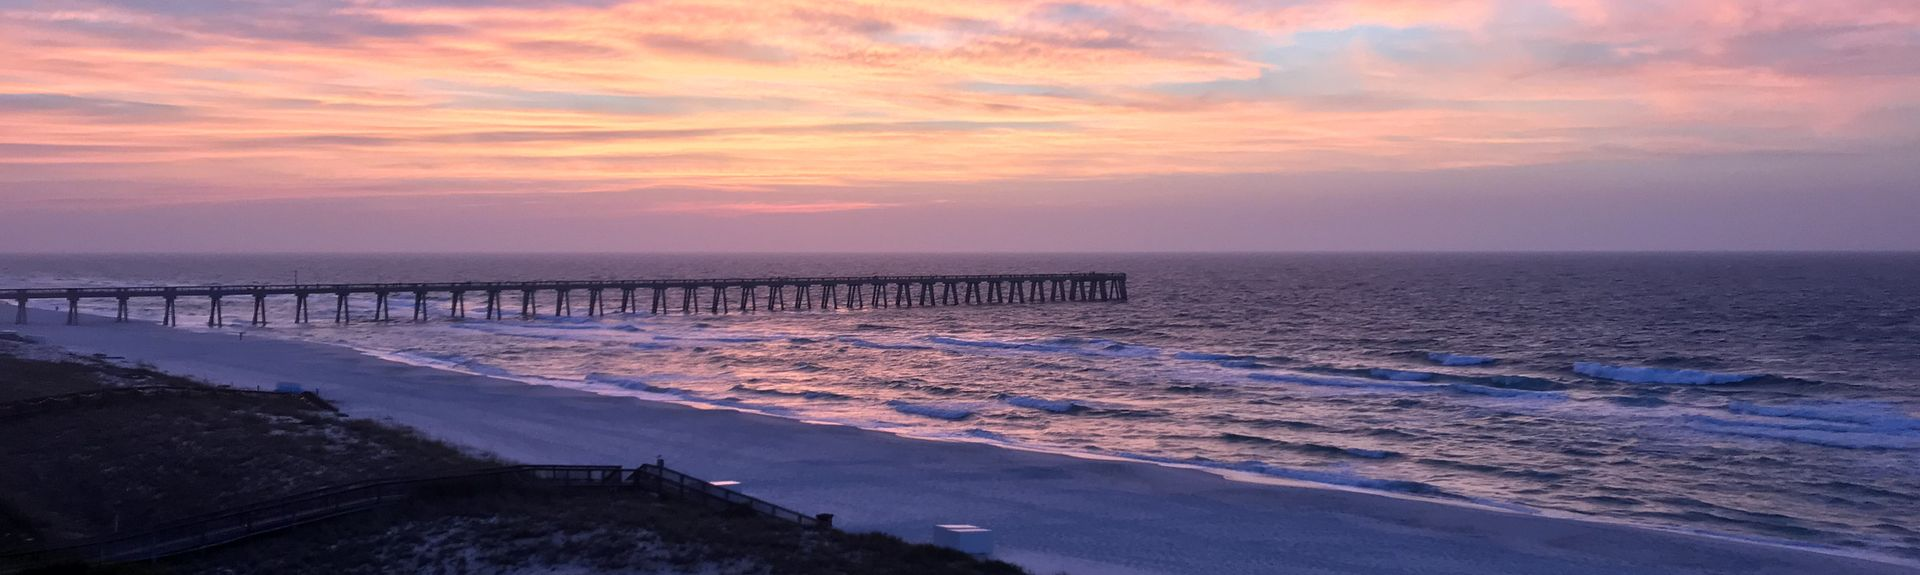 Sundunes, Navarre Beach, Pensacola Beach, FL, USA